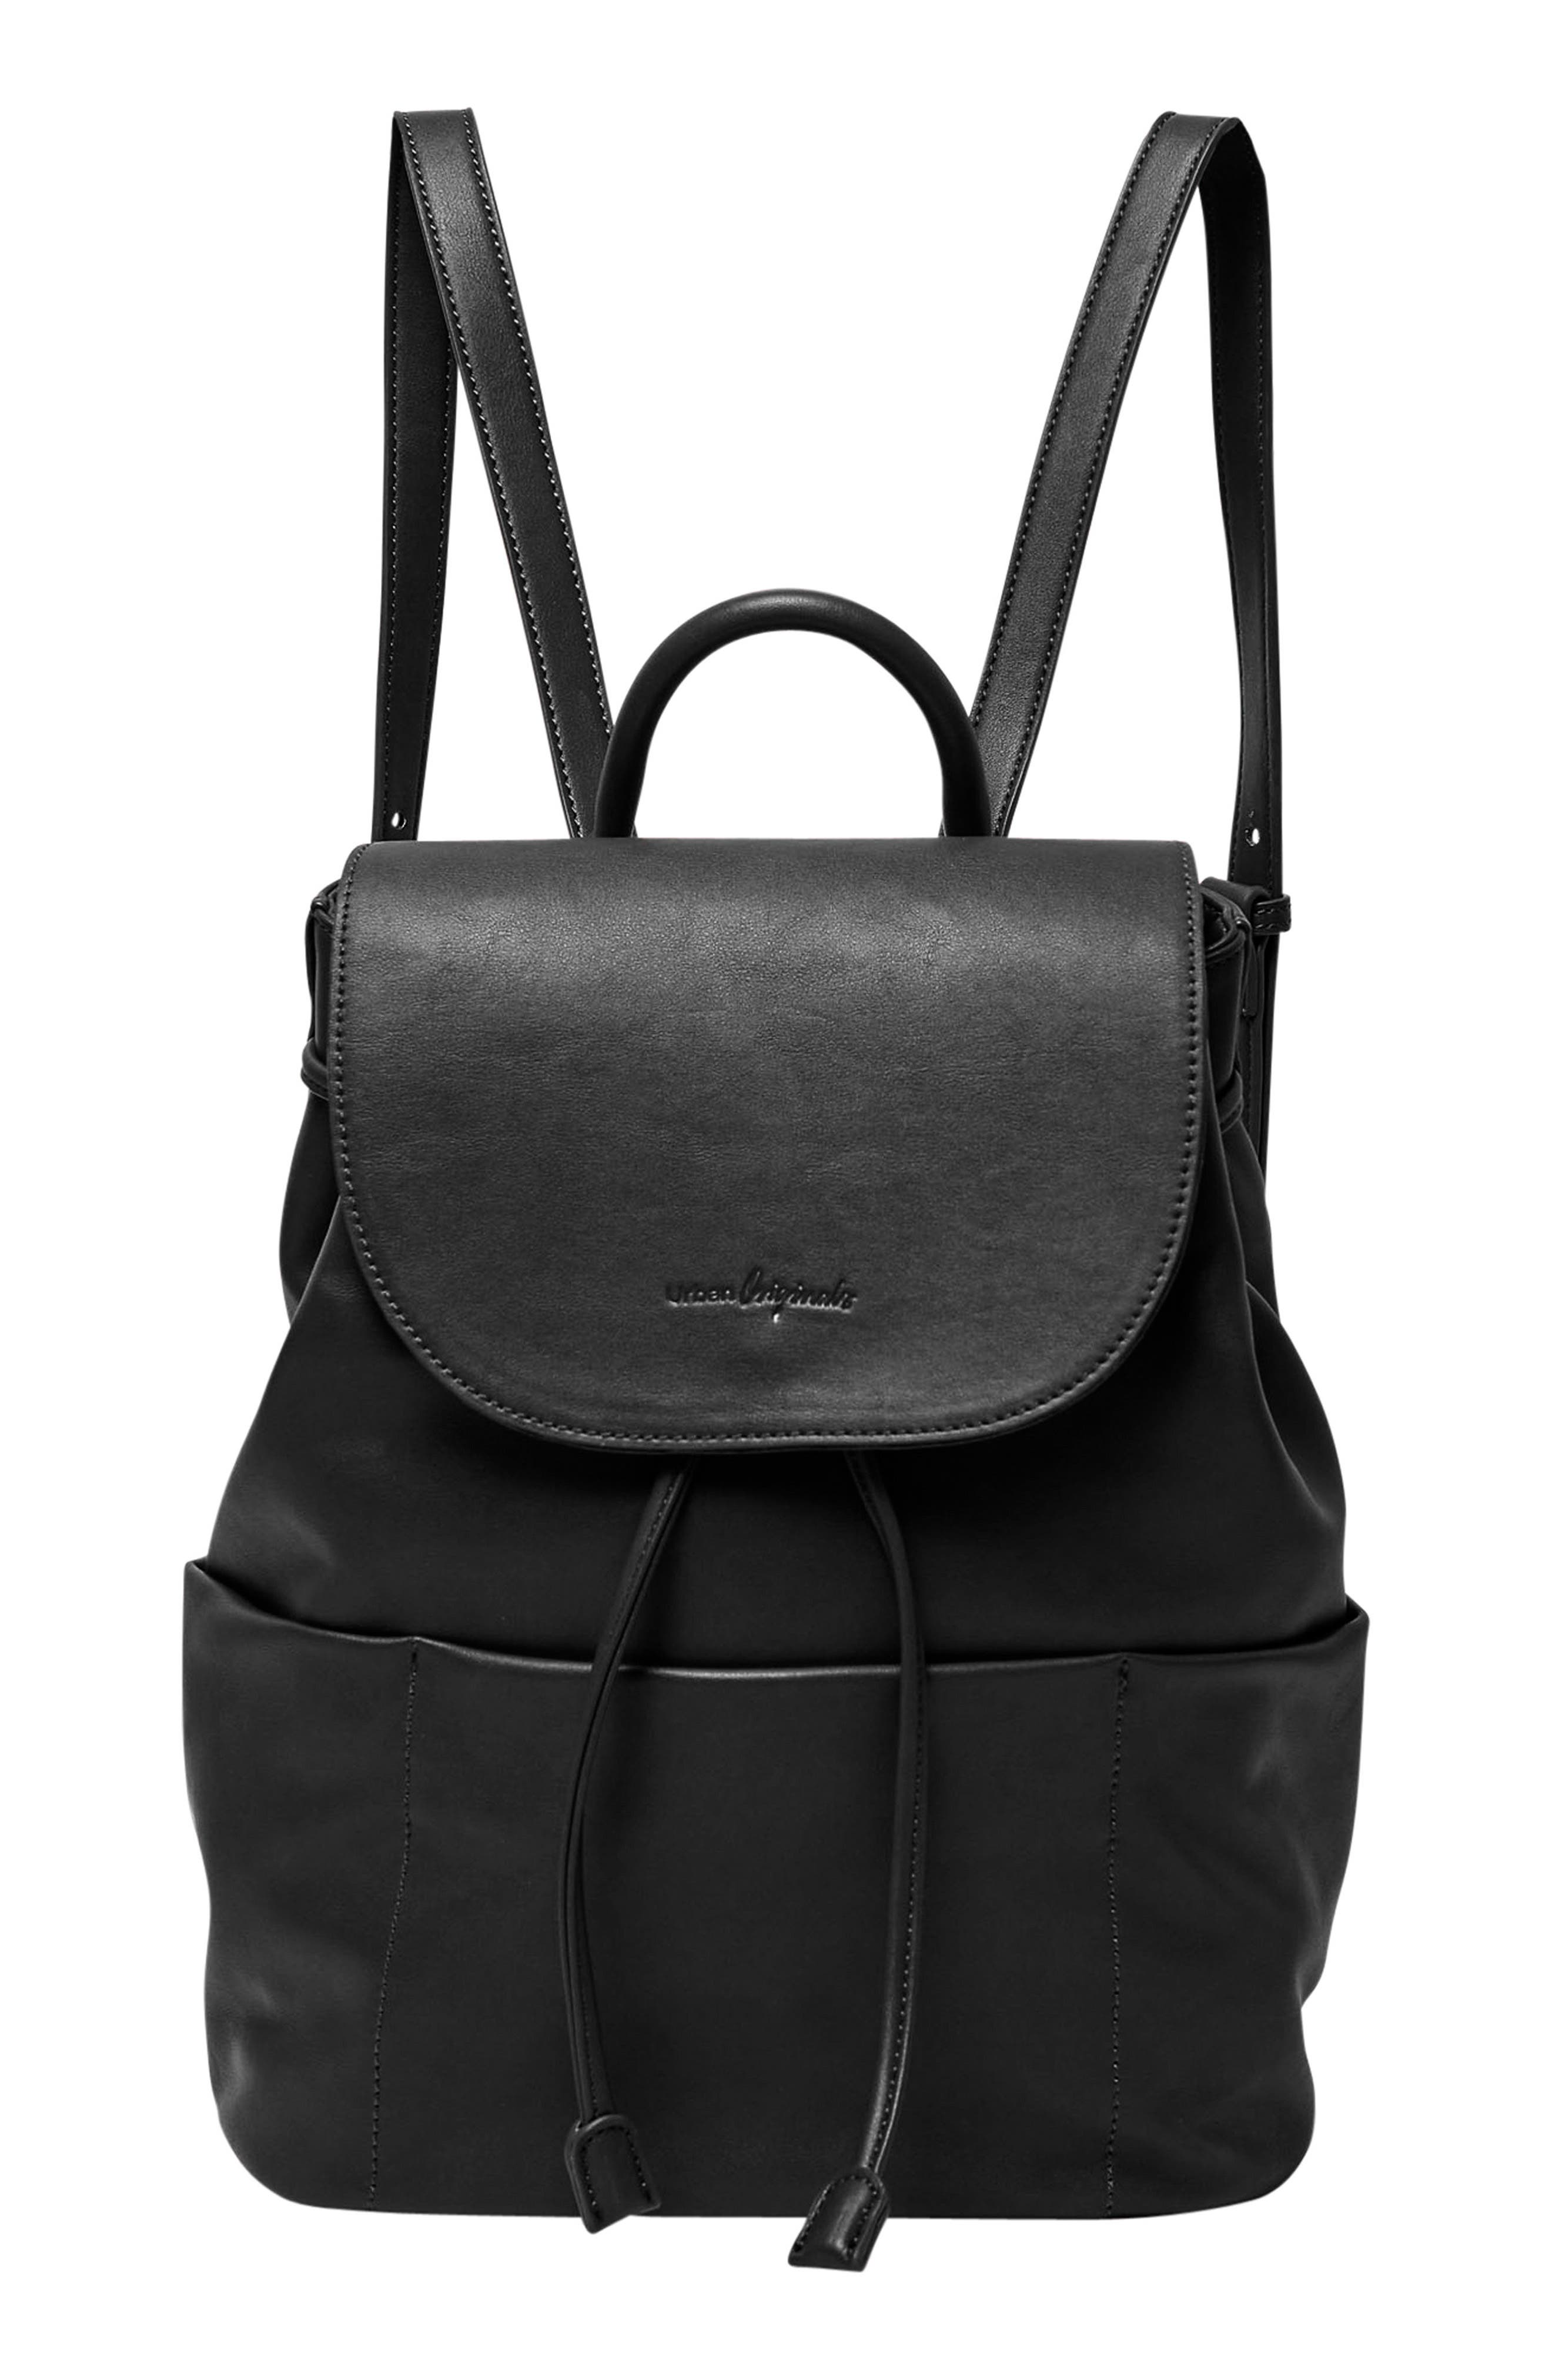 Splendour Vegan Leather Backpack,                             Main thumbnail 1, color,                             002